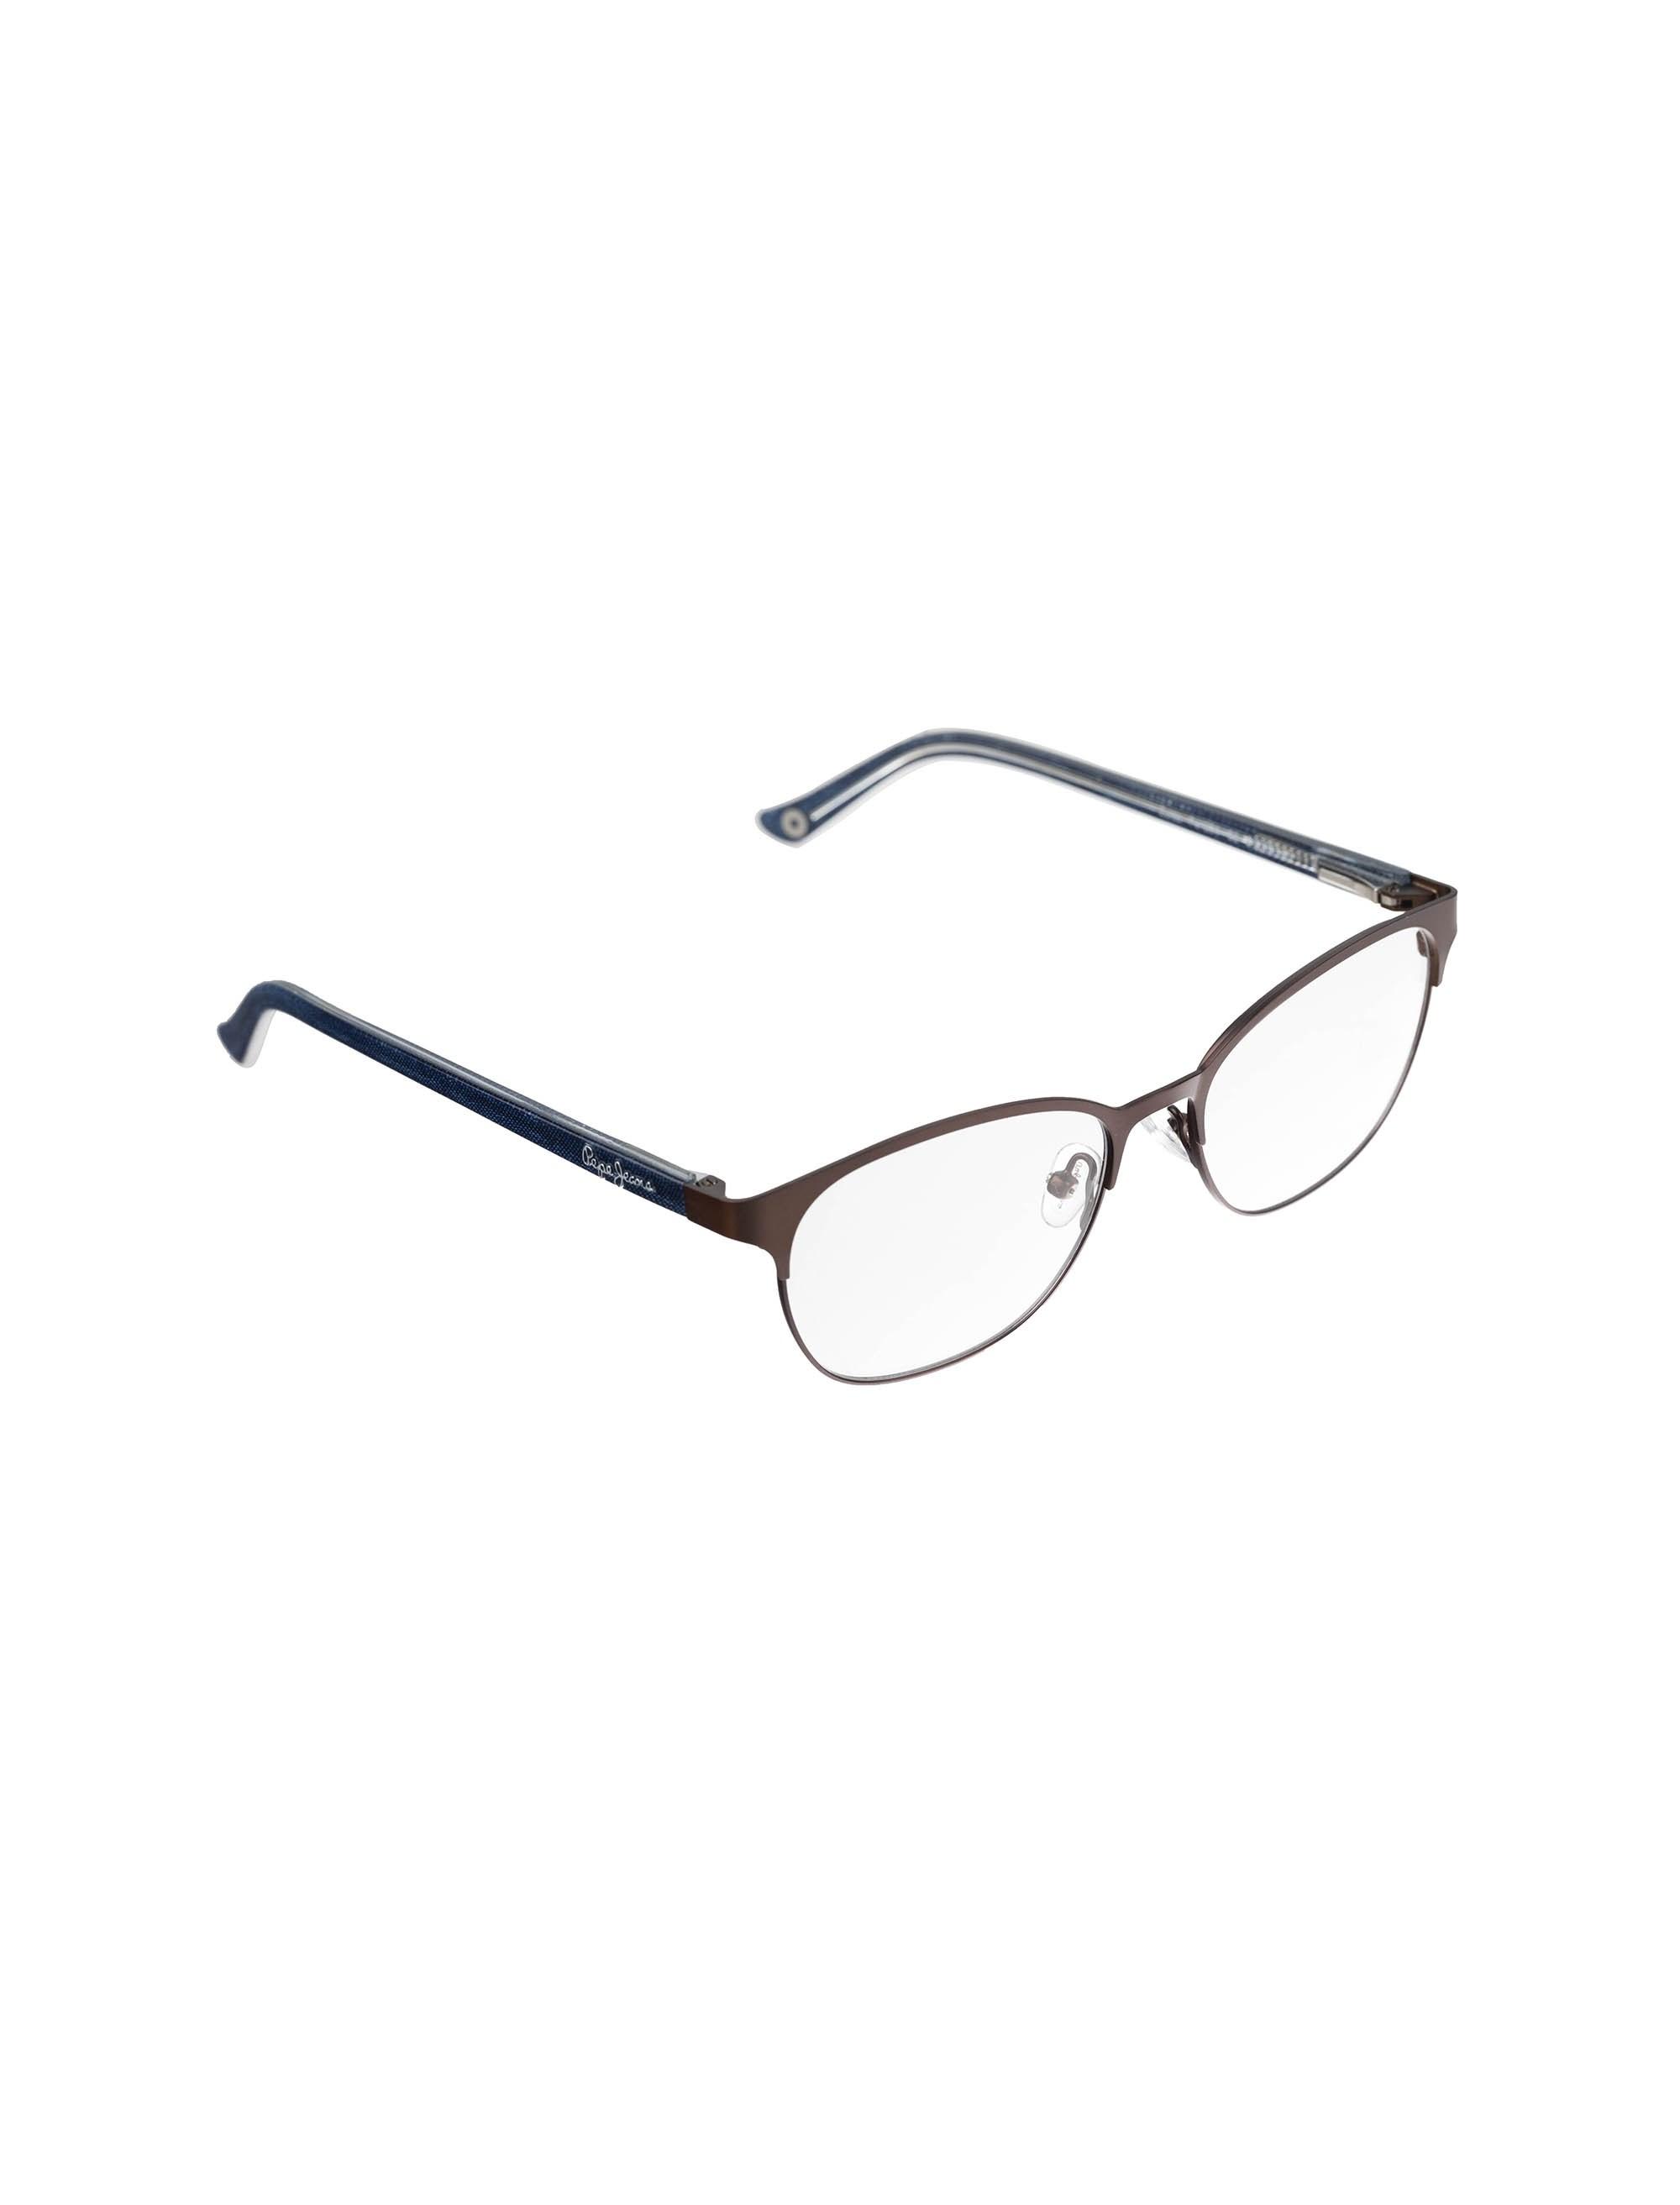 عینک طبی ویفرر زنانه - پپه جینز - قهوه اي - 4